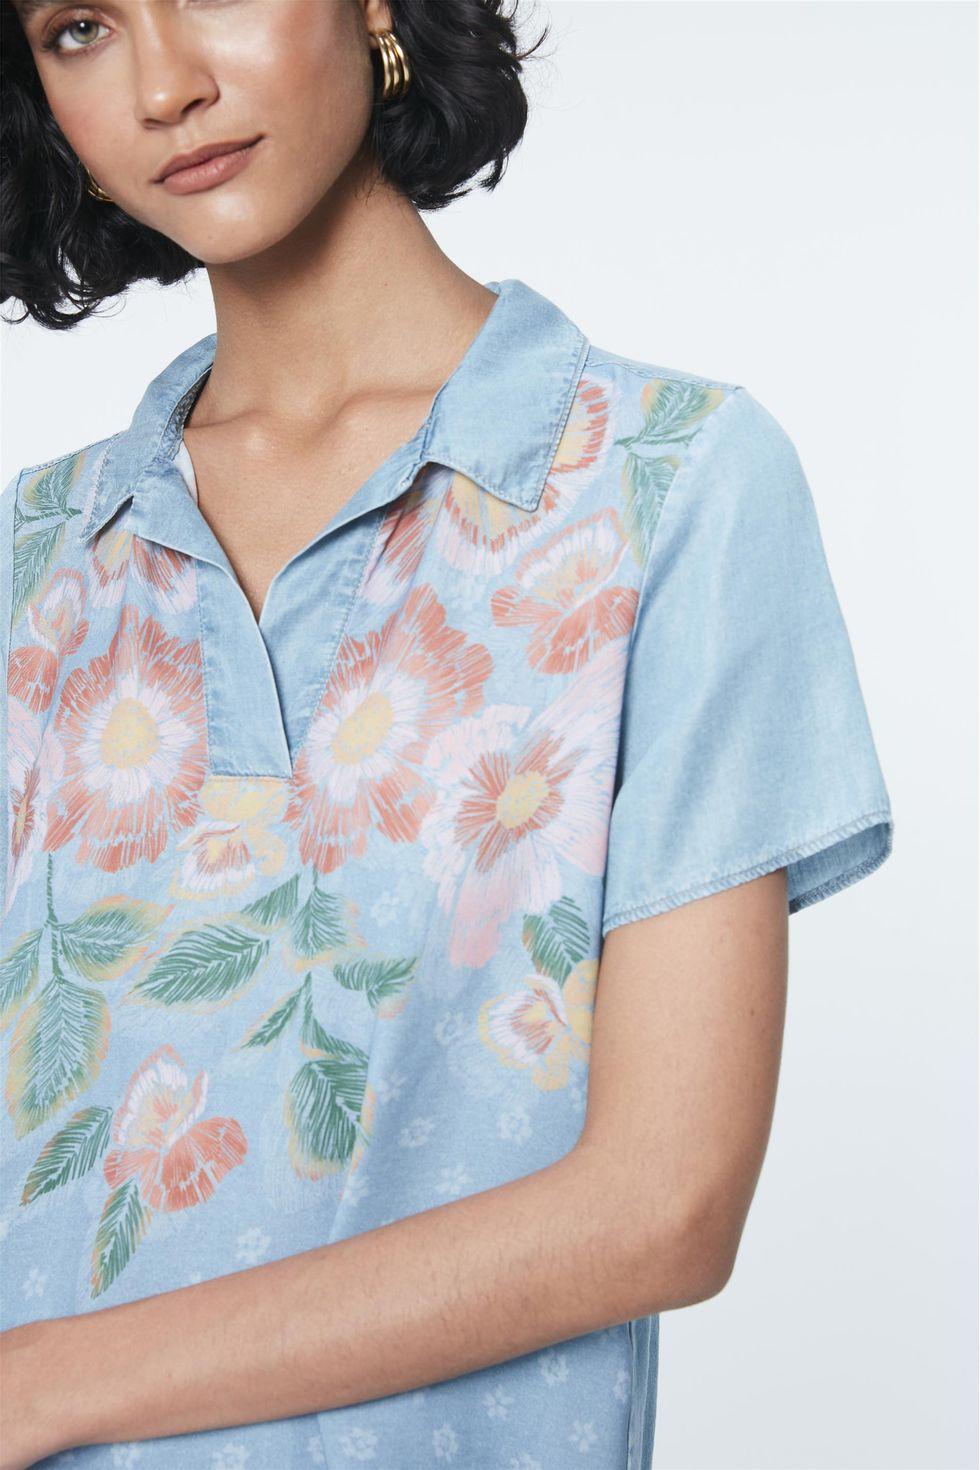 Blusa-Jeans-Estampa-Floral-e-Gola-Frente--